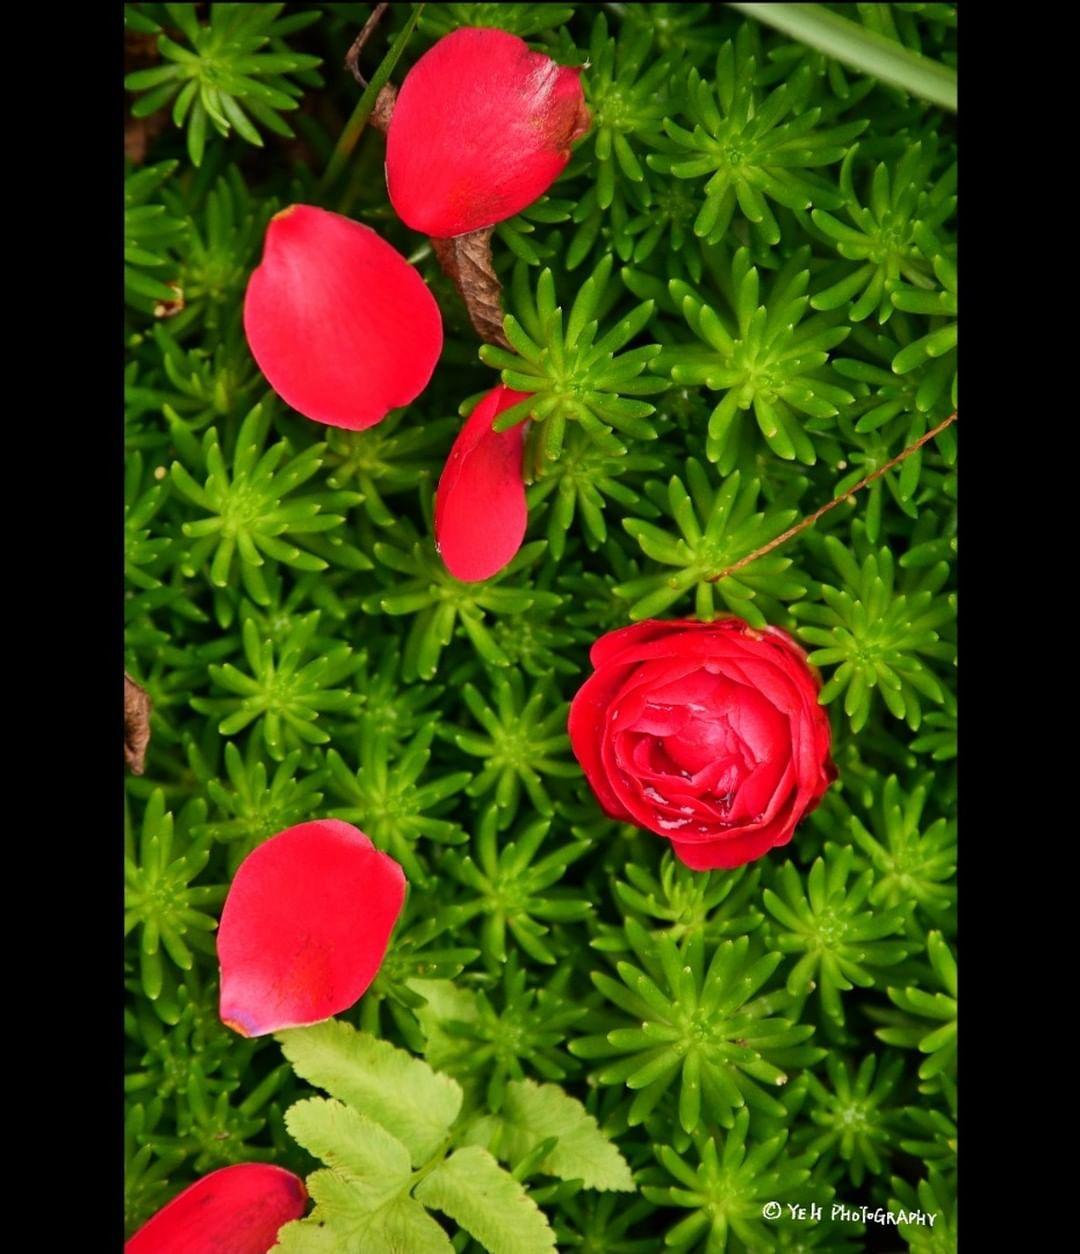 . [Life-宜蘭] Red and green 。 ------------------------------------- Location:HOME CAMERA:LUMIX GX9 LENS:Panasonic G X VARIO 35-100mm F2.8 II POWER O.I.S. Filter:Marumi/CPL #YEH_Photography . . . . #red  #green  #my_daily_flower #flower_special_ #loves_garden #花の写真館 #lovely_flowergarden #flowerart #flowersofinstagram #igscflowers #flowers #東京カメラ部 #bns_flowers #tokyocameraclub #superb_flowers #ptk_flowers #ig_discover_petal #kings_flora #flowergram #庭の花 #花好きな人と繋がりたい #lovelyflowers #flower_shotz #写真好